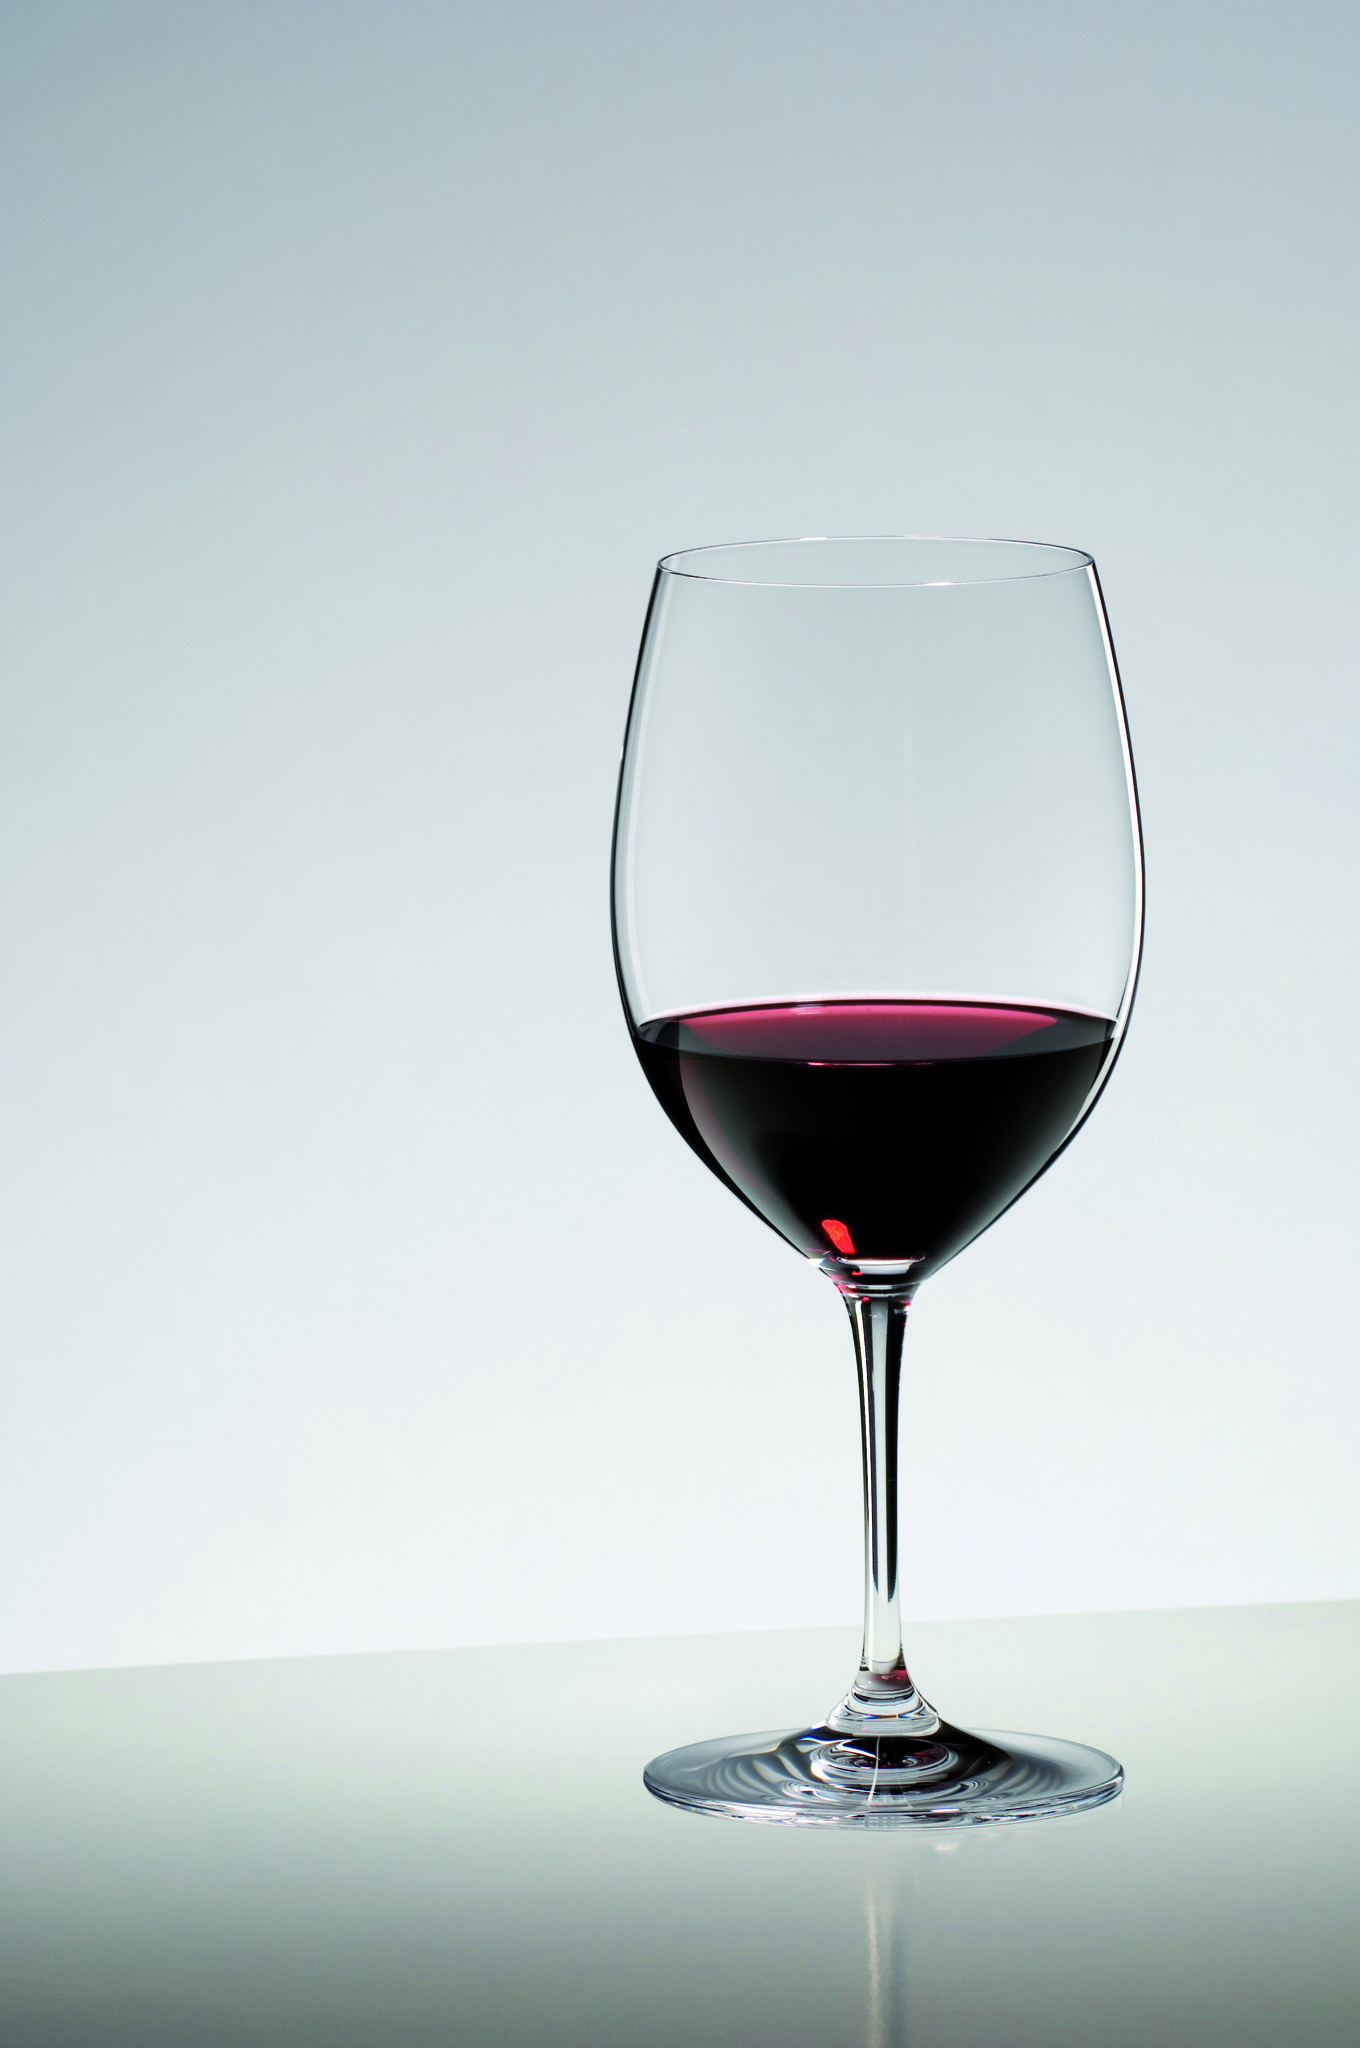 Бокалы Набор бокалов для красного вина 2шт 590мл Riedel Vinum Brunello Di Montalcino nabor-bokalov-dlya-krasnogo-vina-2-sht-590-ml-riedel-vinum-brunello-di-montalcino-avstriya.jpg